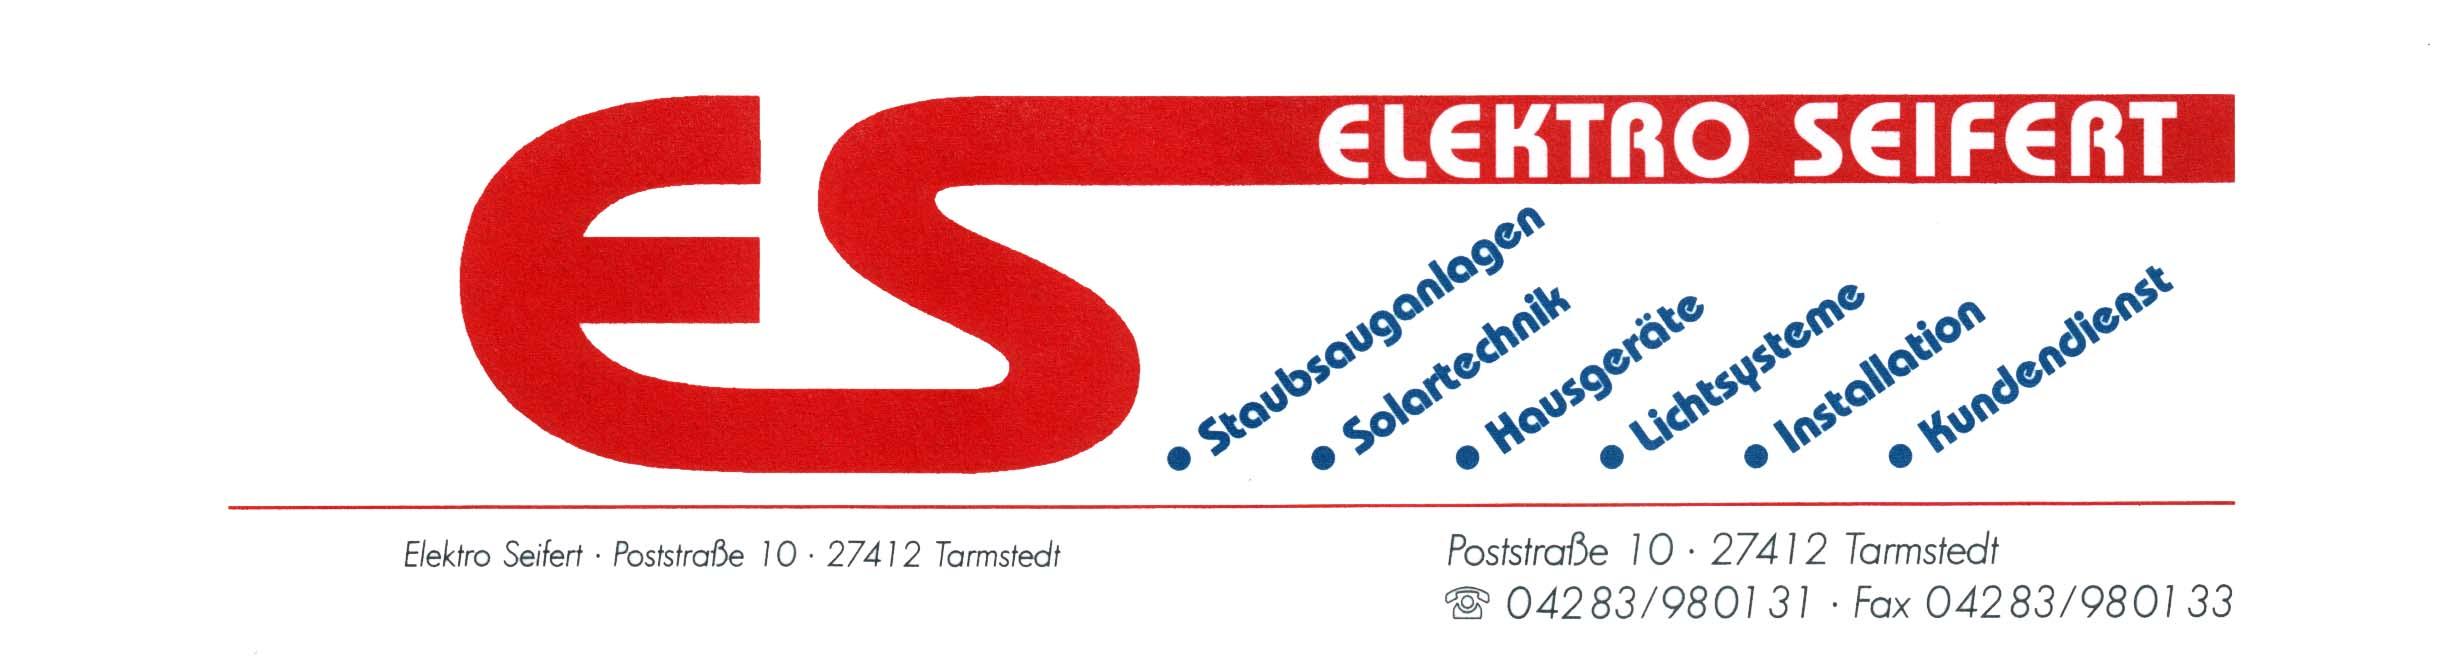 Elektro Seifert